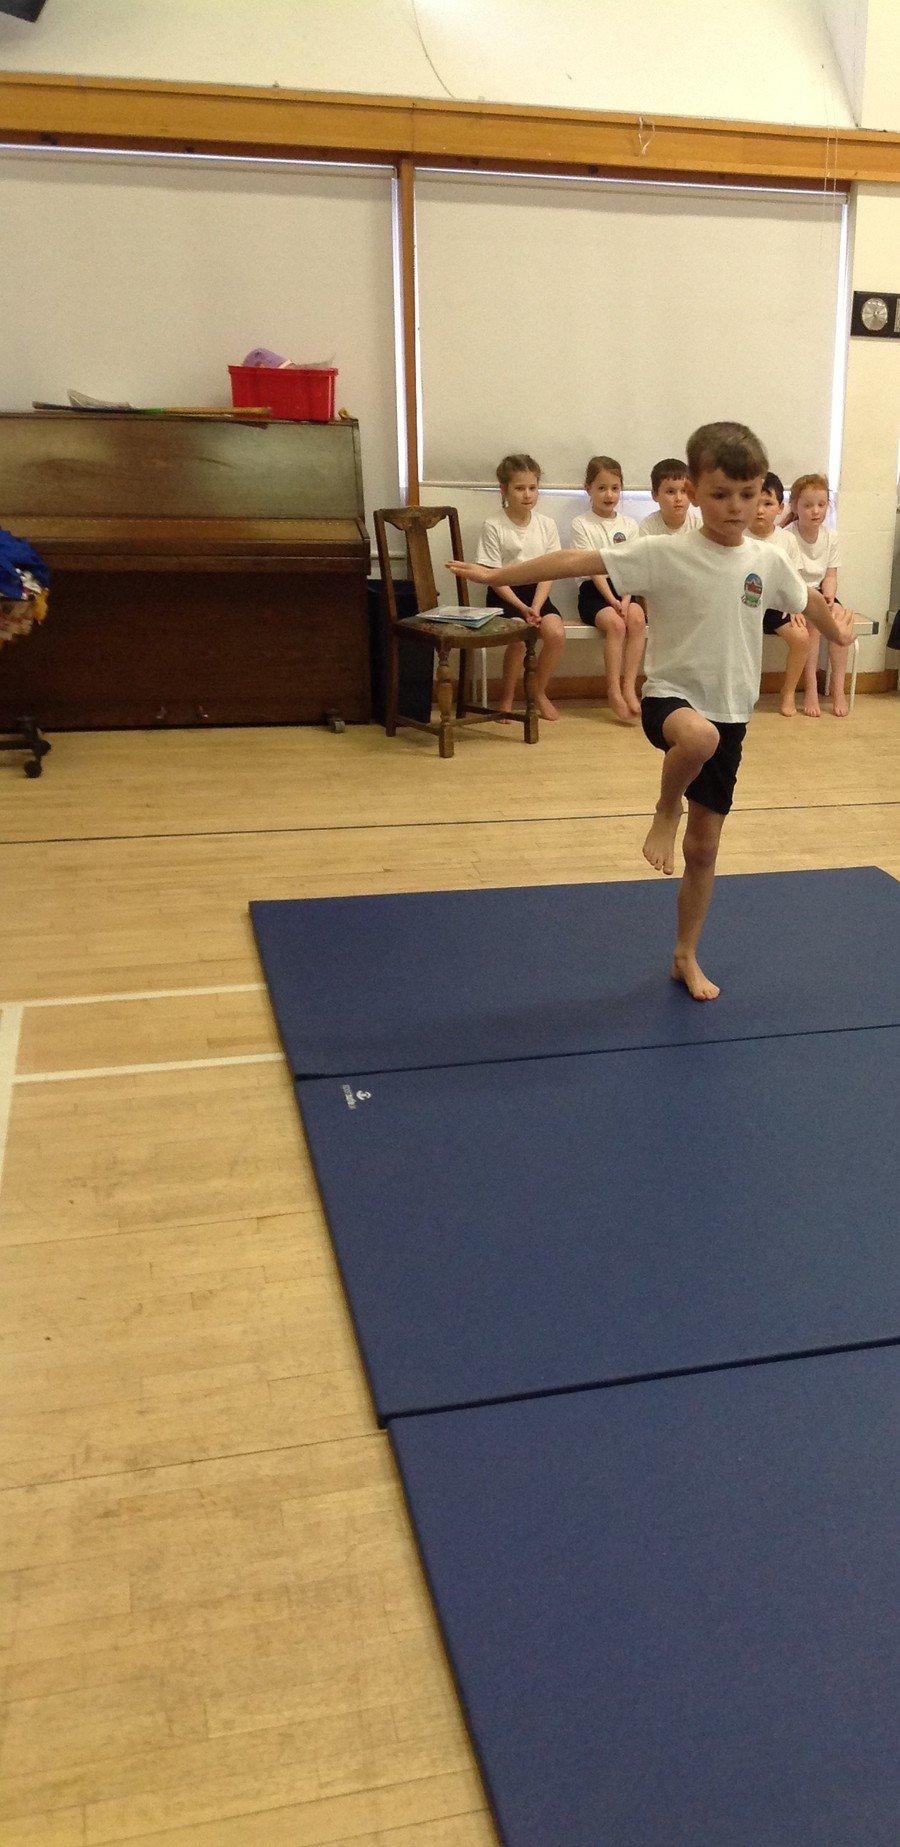 Alfie's one leg balance was great!